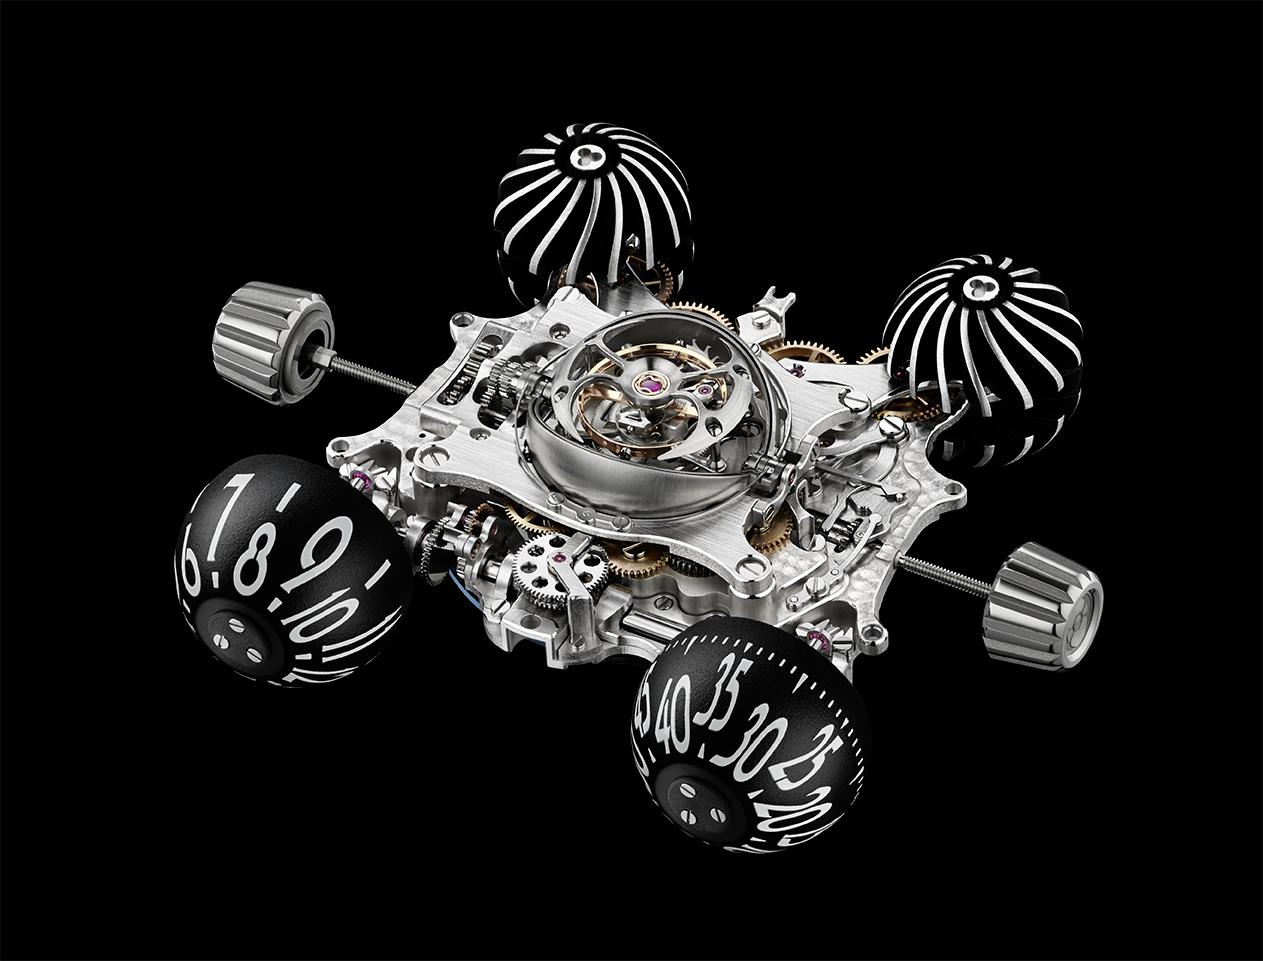 MB&F Horological Machine No.6 Final Edition engine